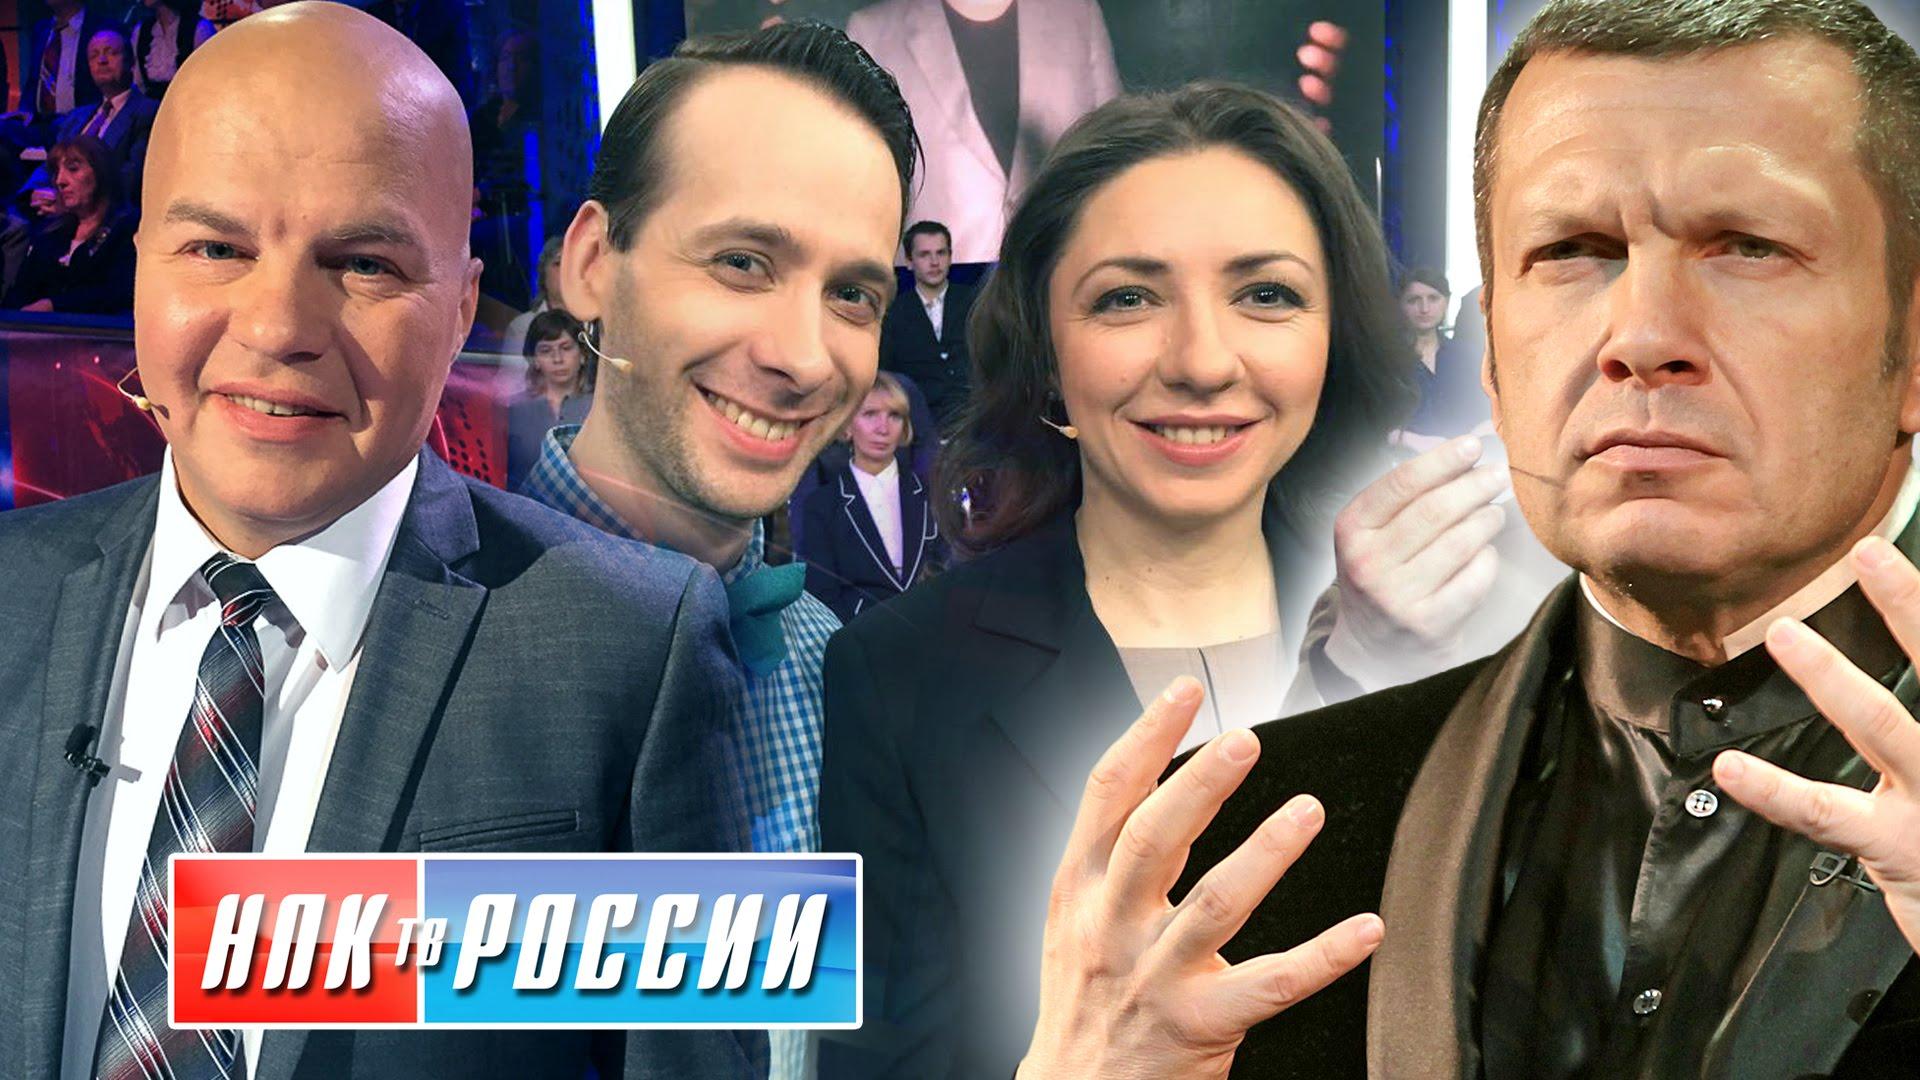 https://via-midgard.com/uploads/posts/2016-04/pochemu-na-rossijskix-telekanalax-opravdyvayut.jpg